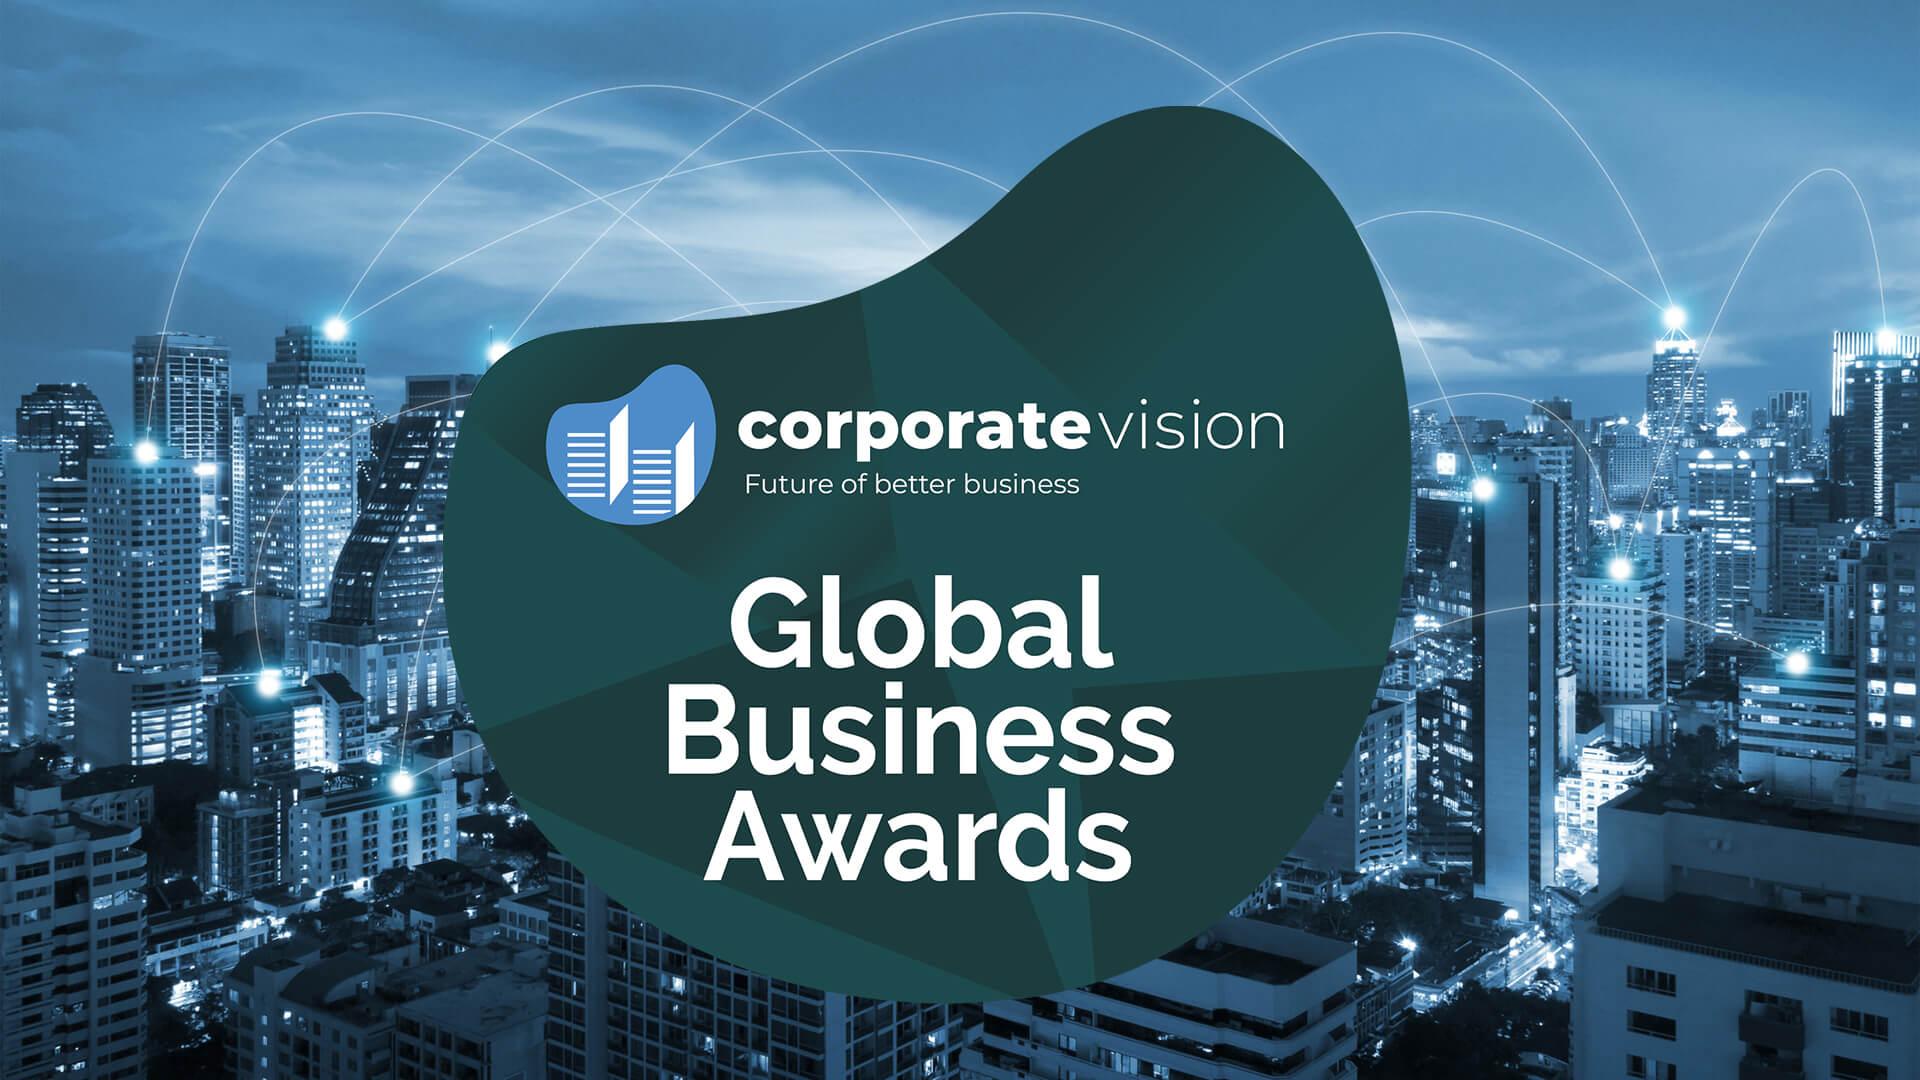 global business awards